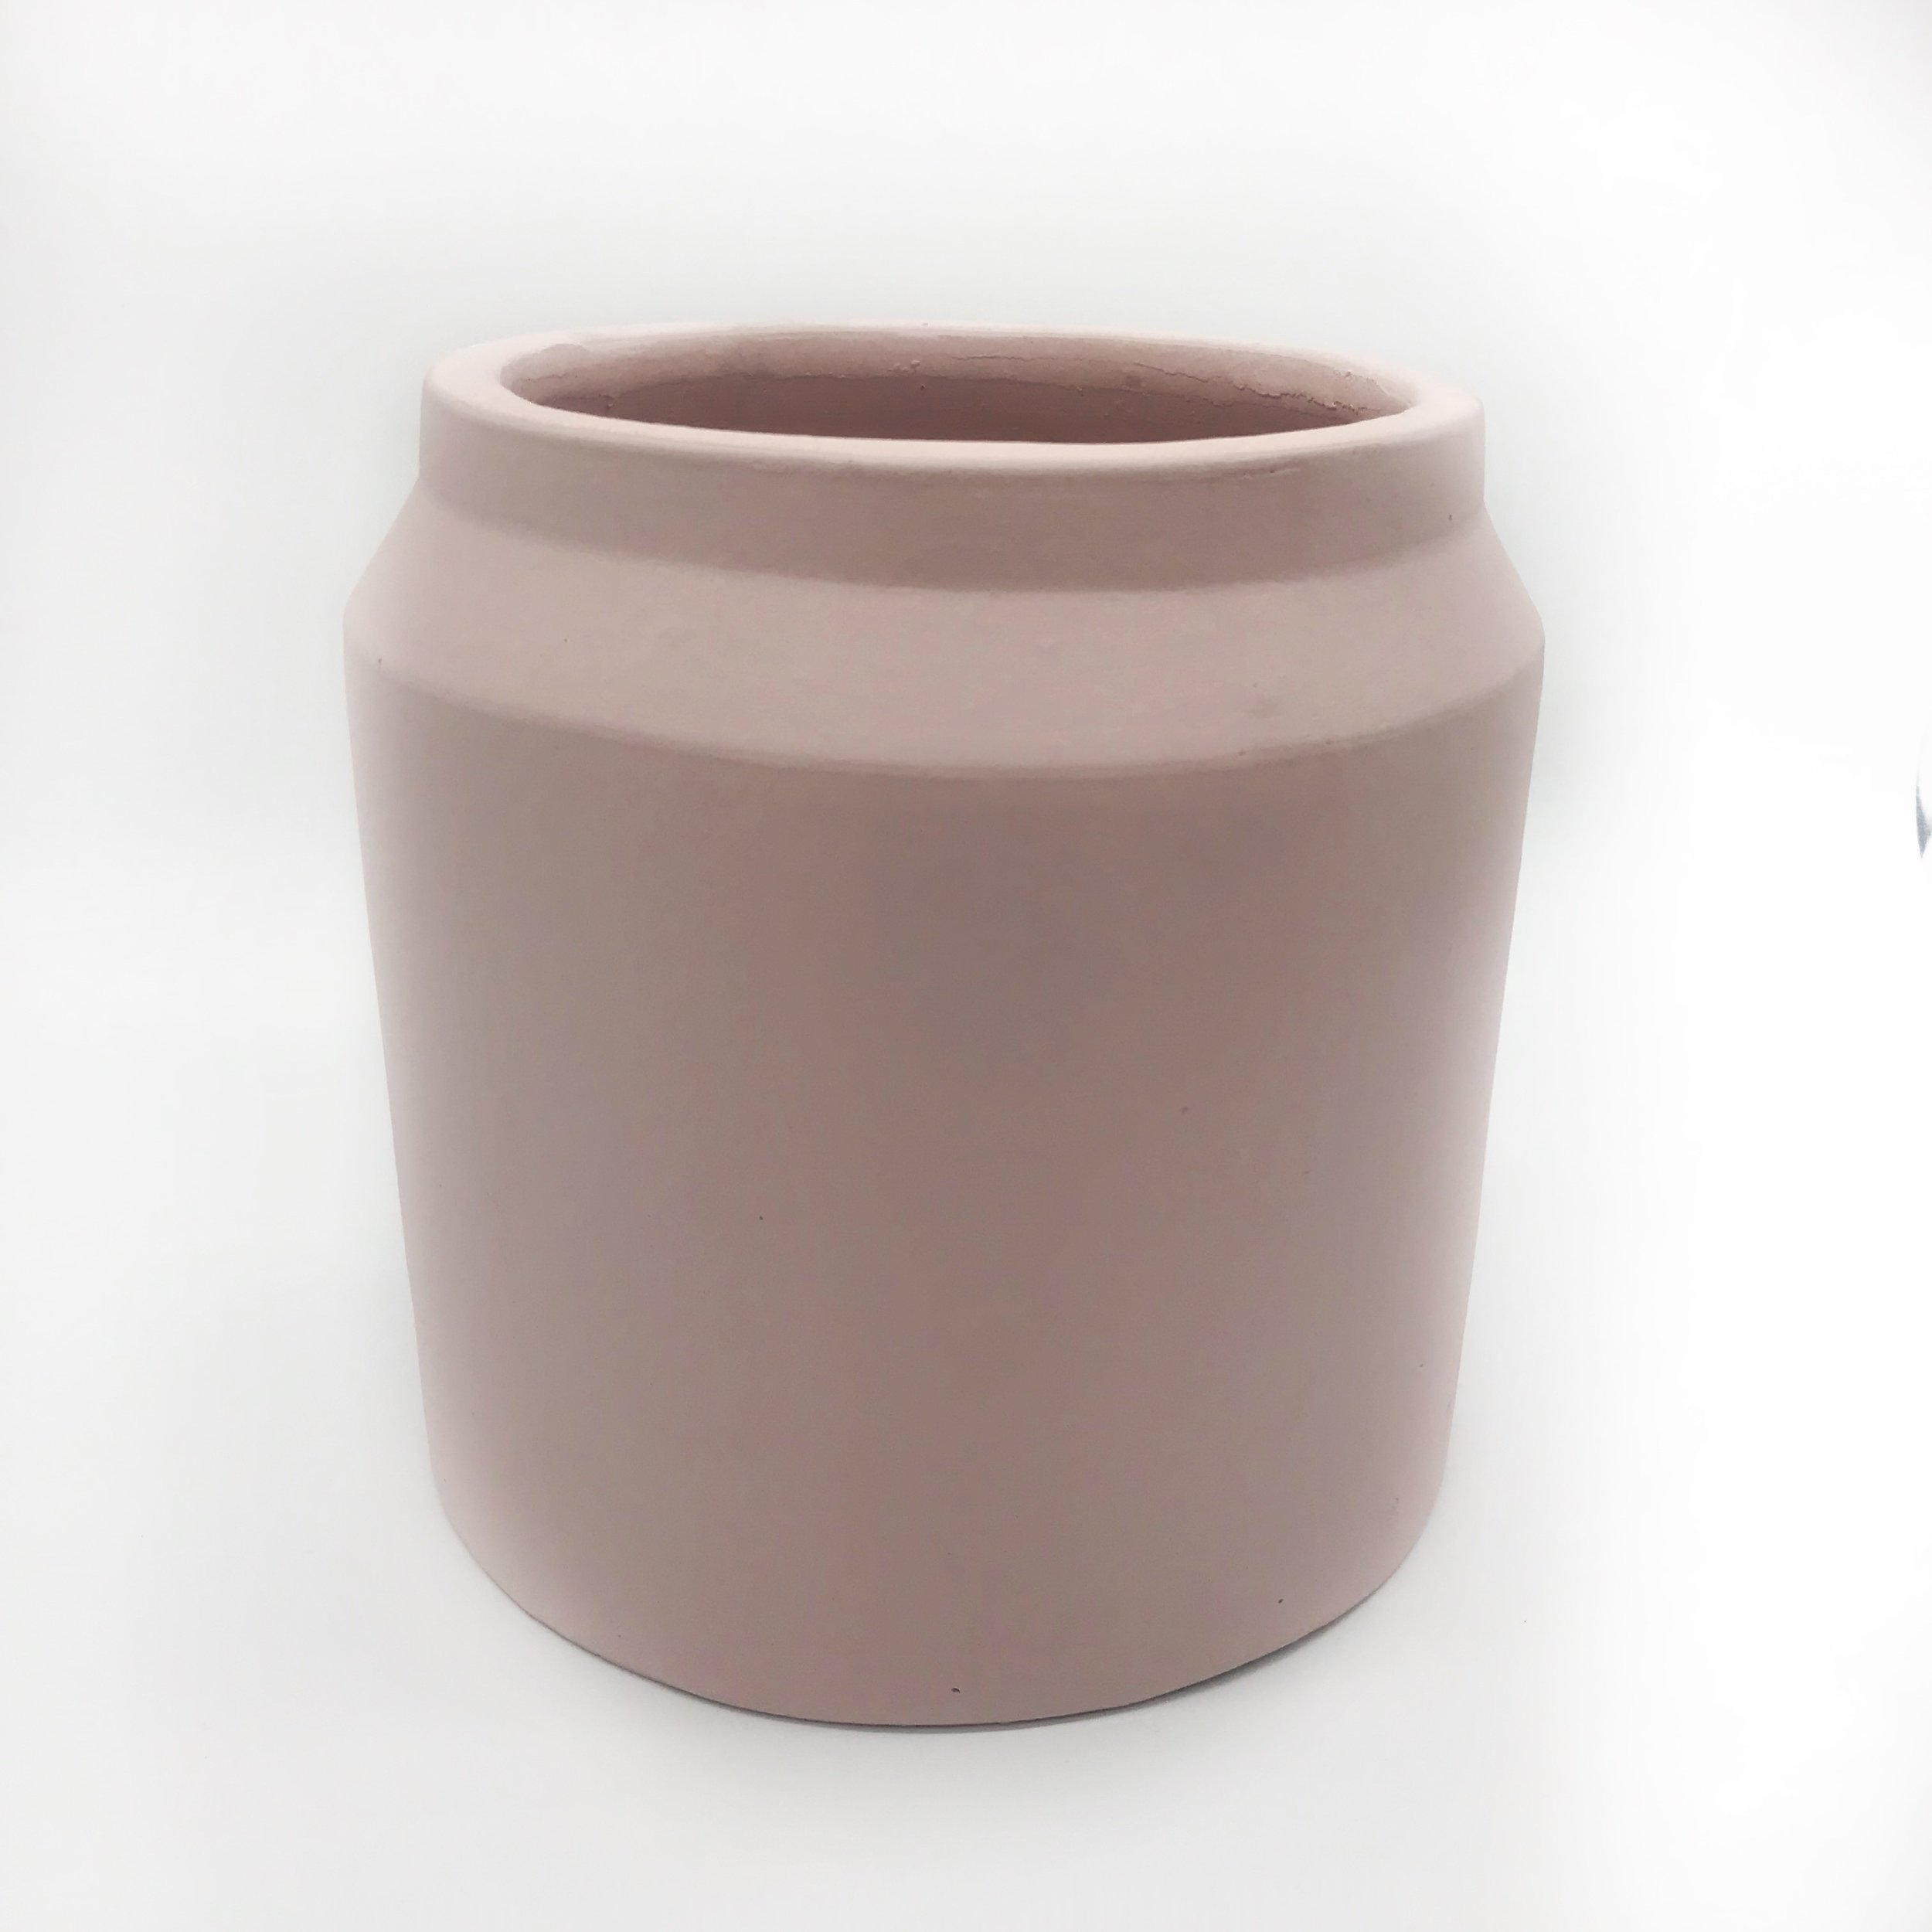 Planter - blush (large)  Price: $5.00  Qty: 5